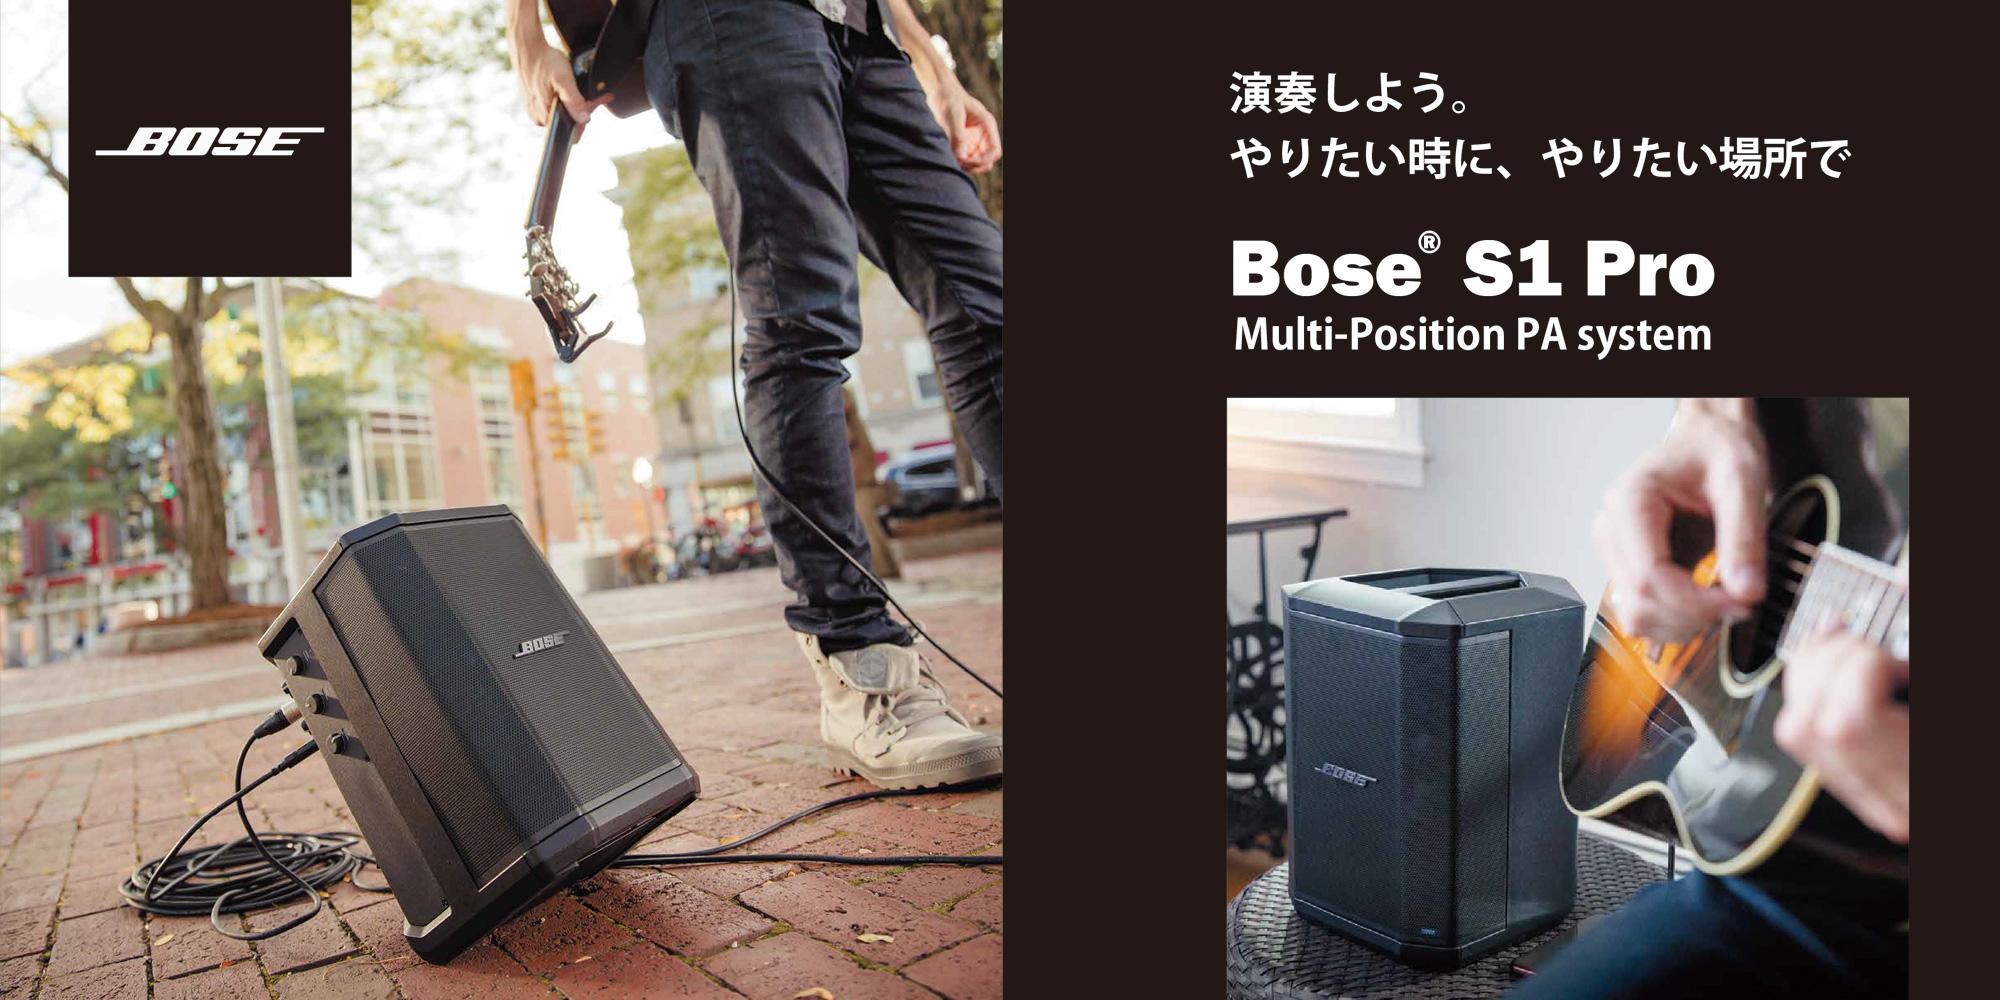 Bose S1 Pro Multi-Position PA system を発表!